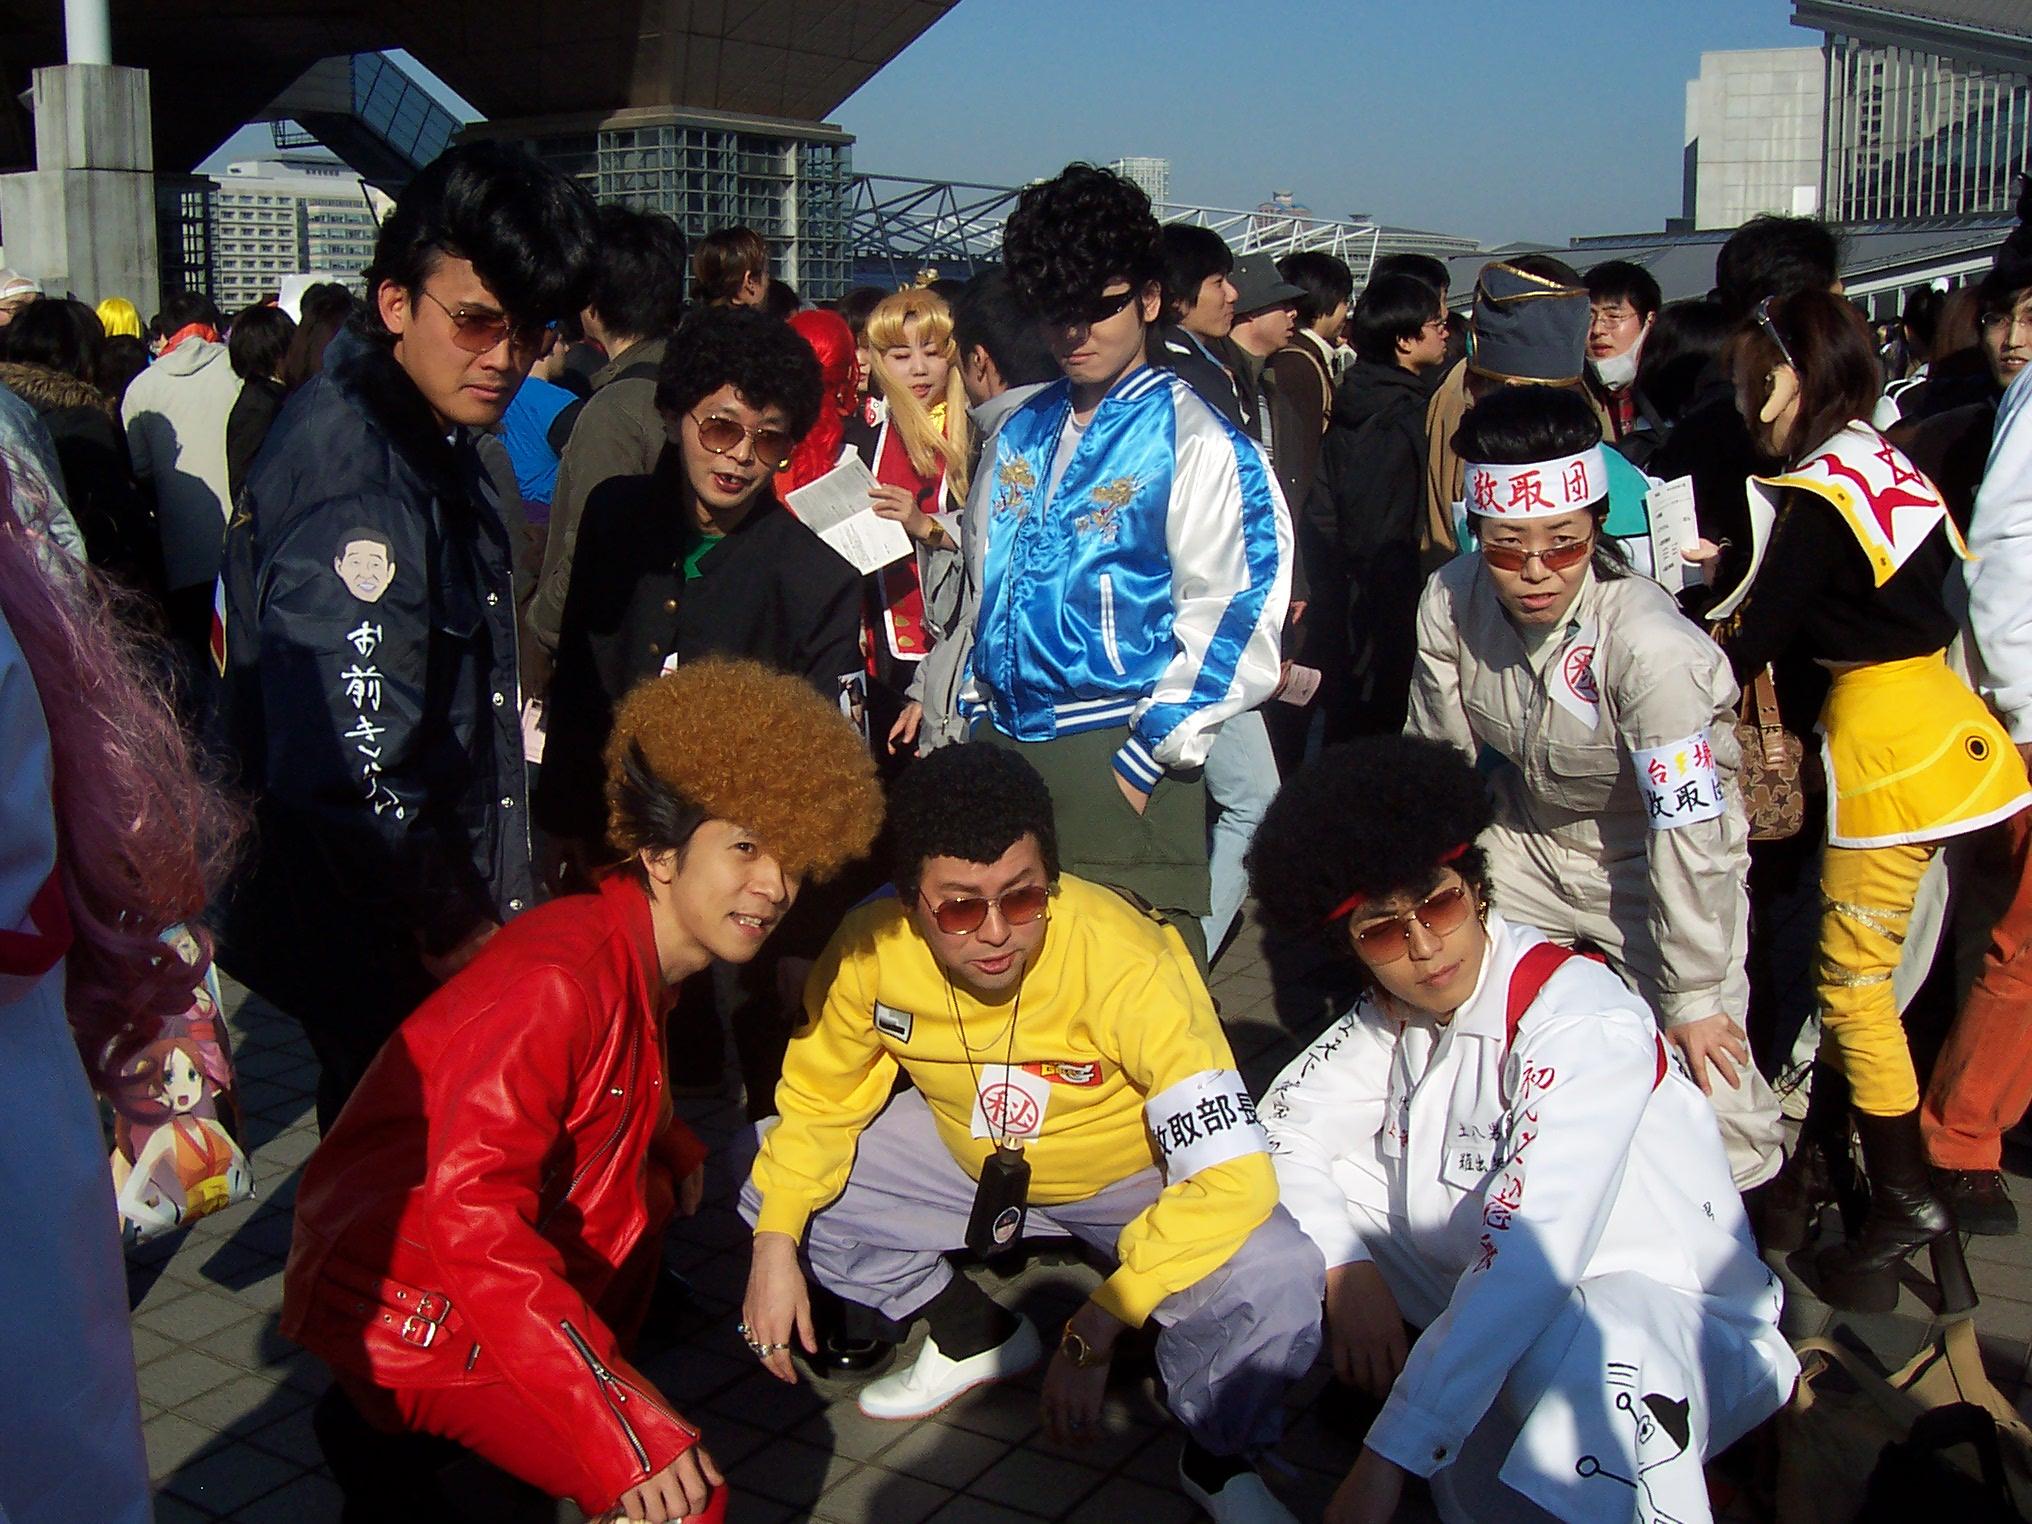 https://i0.wp.com/upload.wikimedia.org/wikipedia/commons/2/23/JapaneseBosozoku.jpg